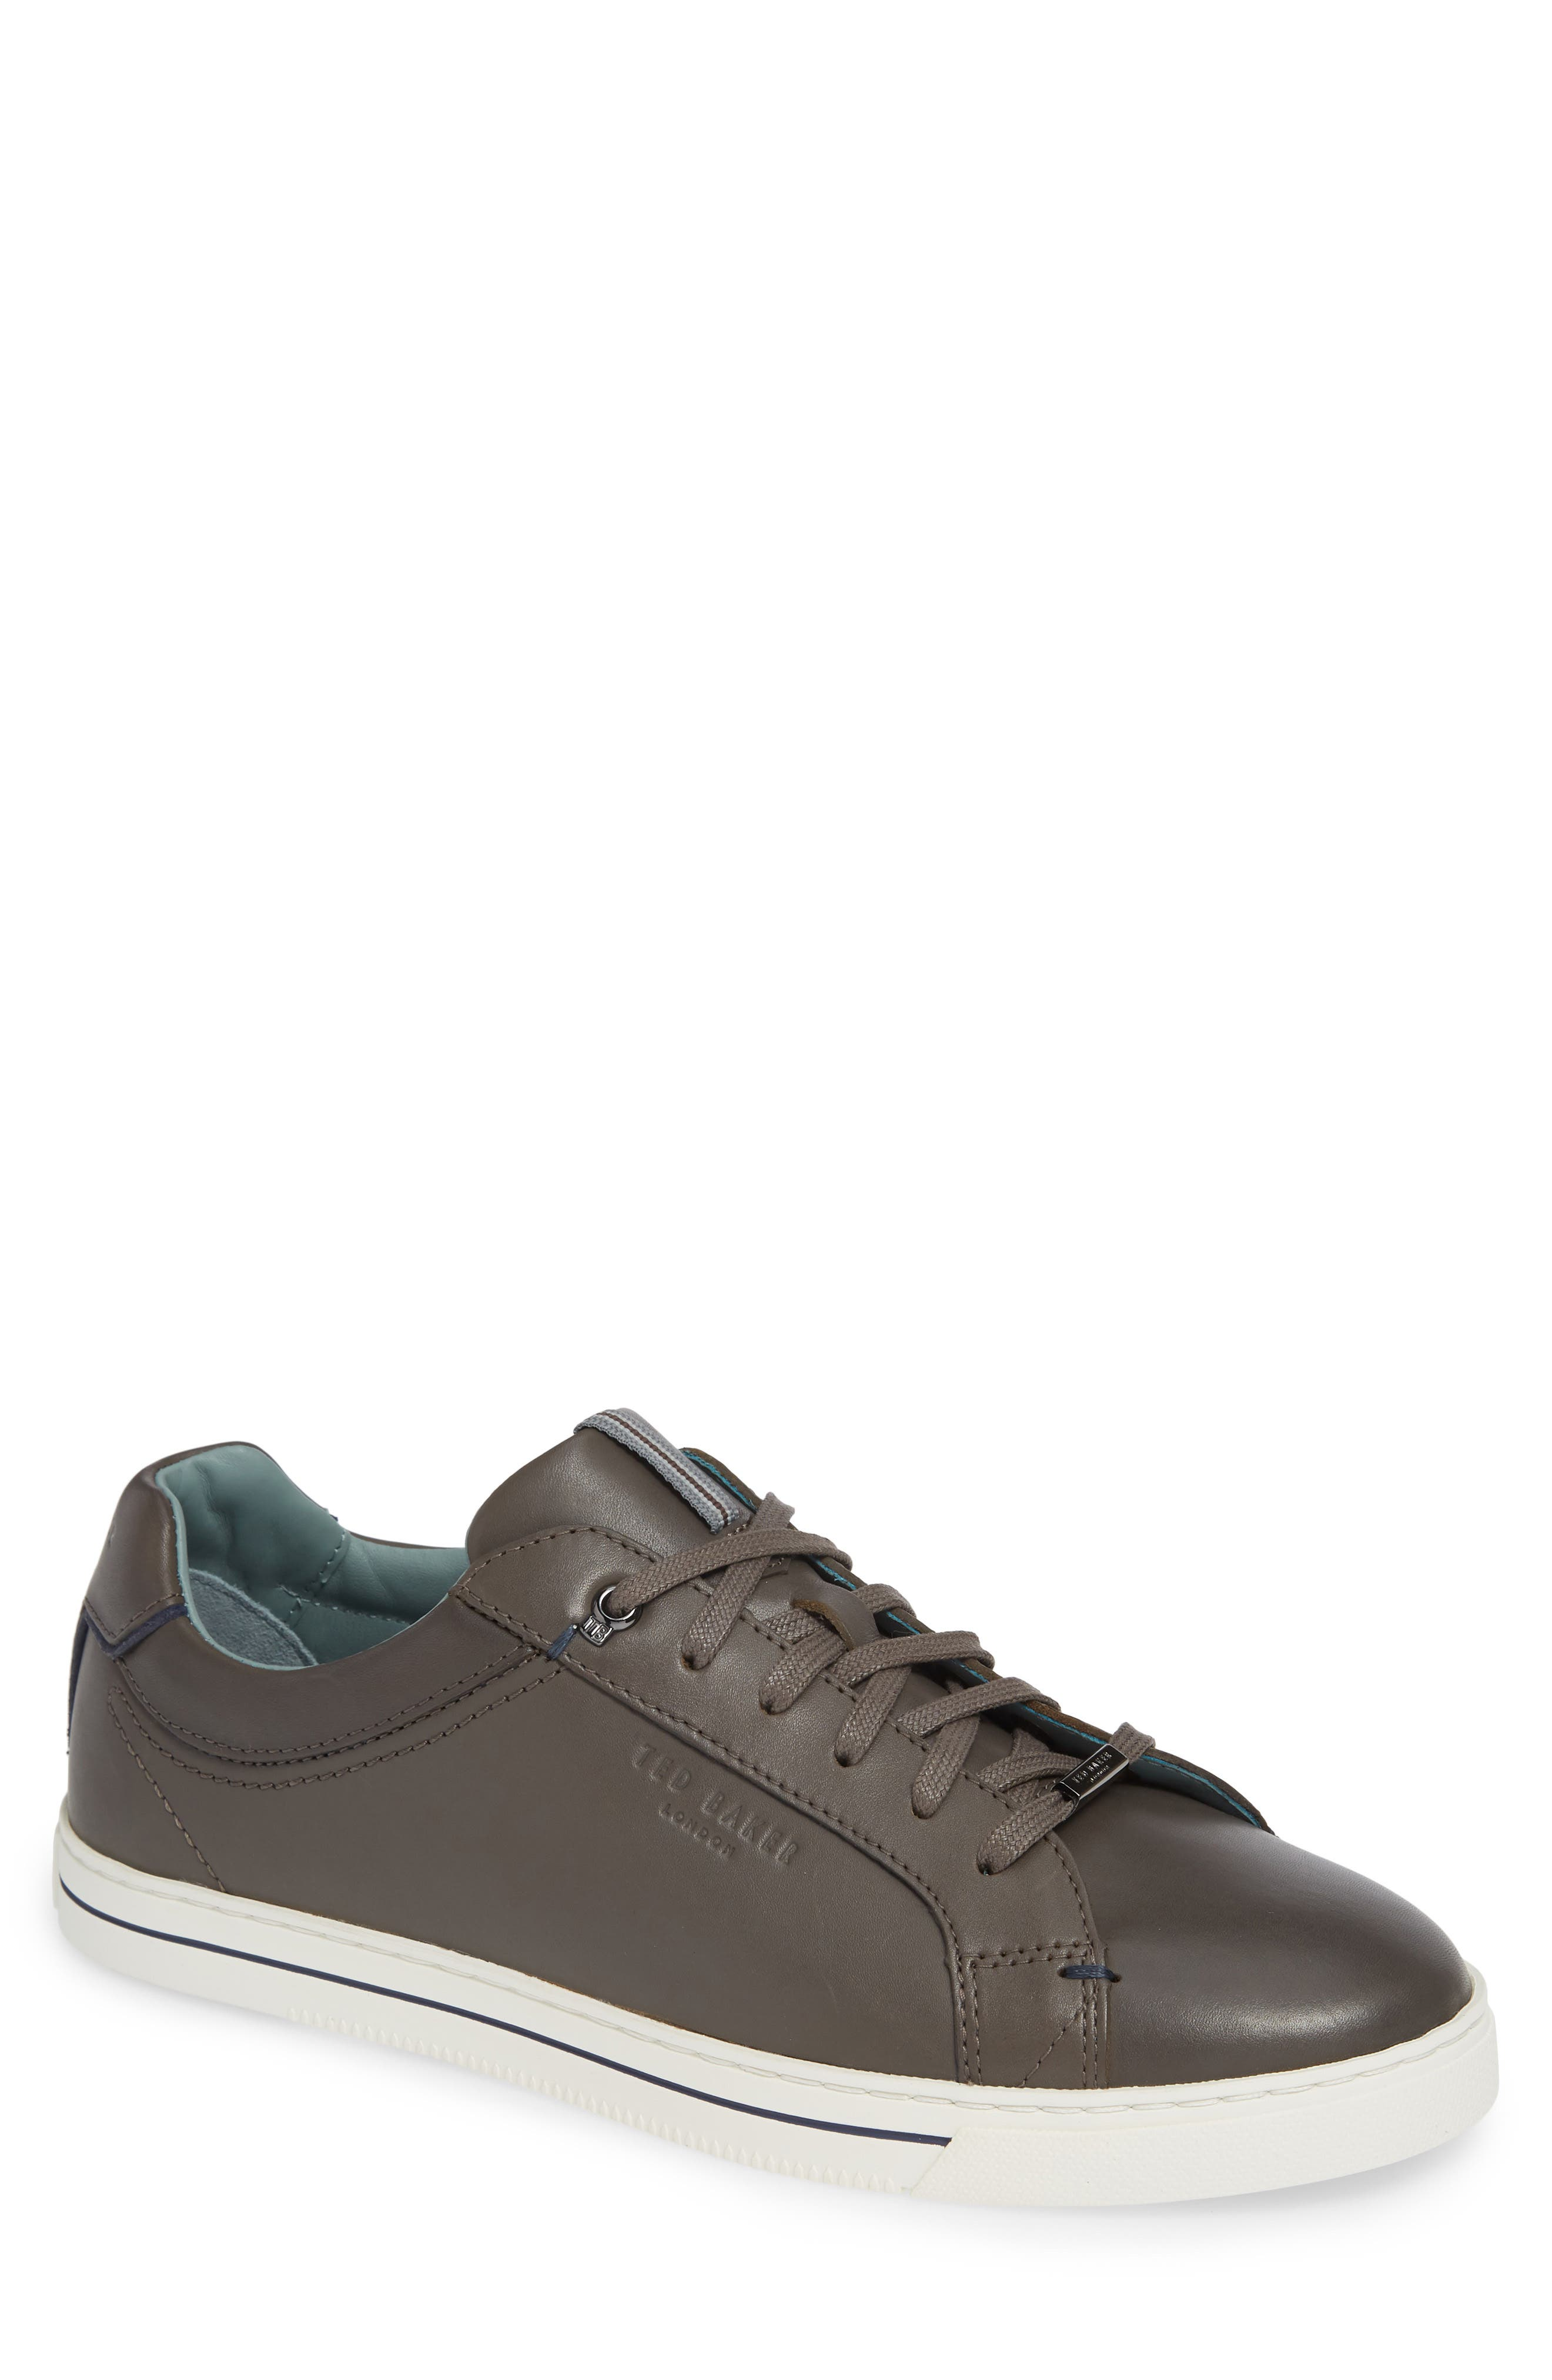 Thawne Sneaker,                             Main thumbnail 1, color,                             DARK GREY LEATHER